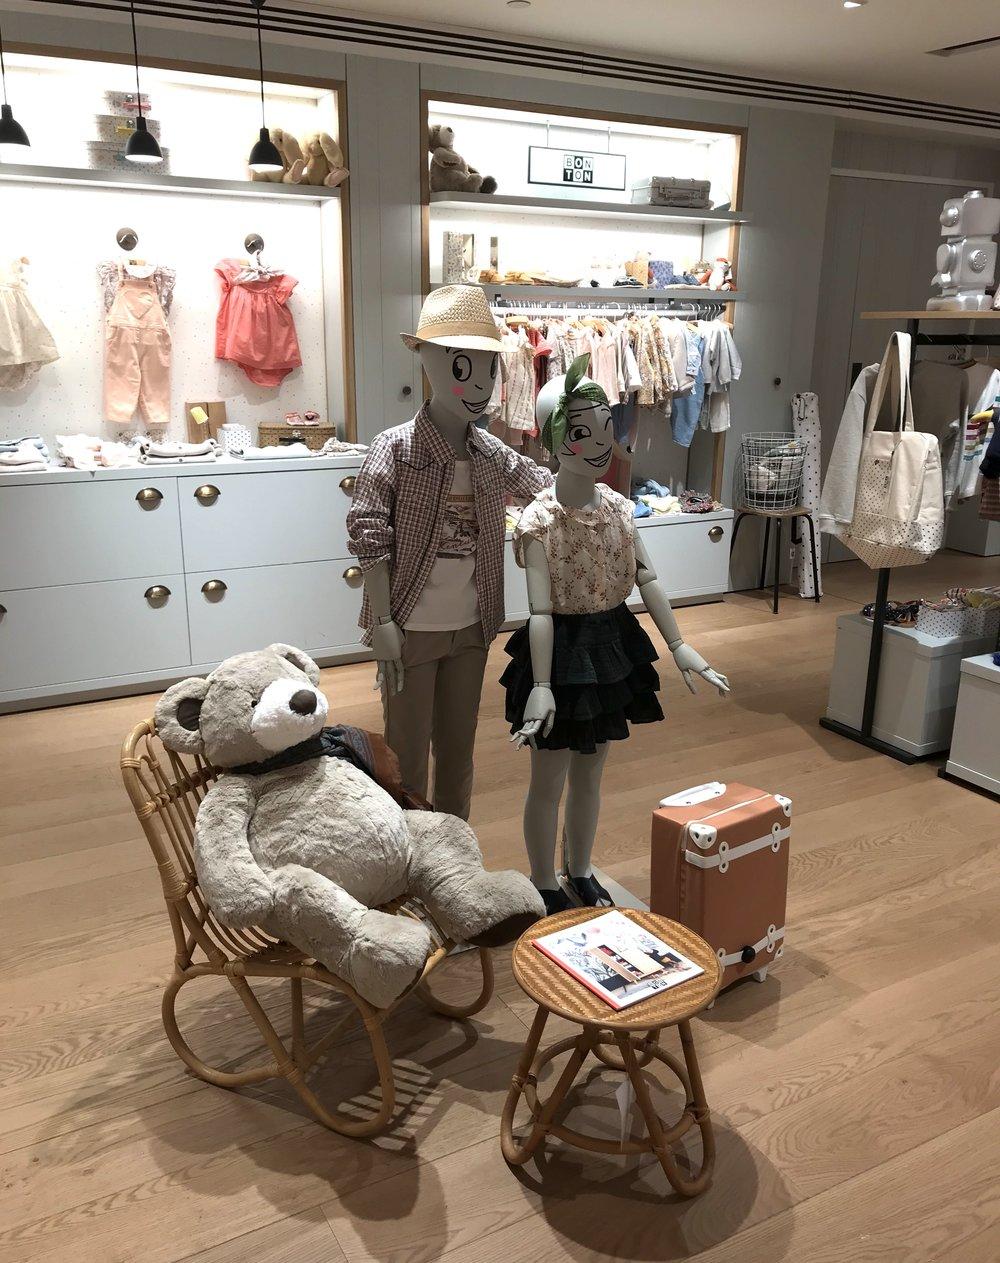 Bonton : French children's brand